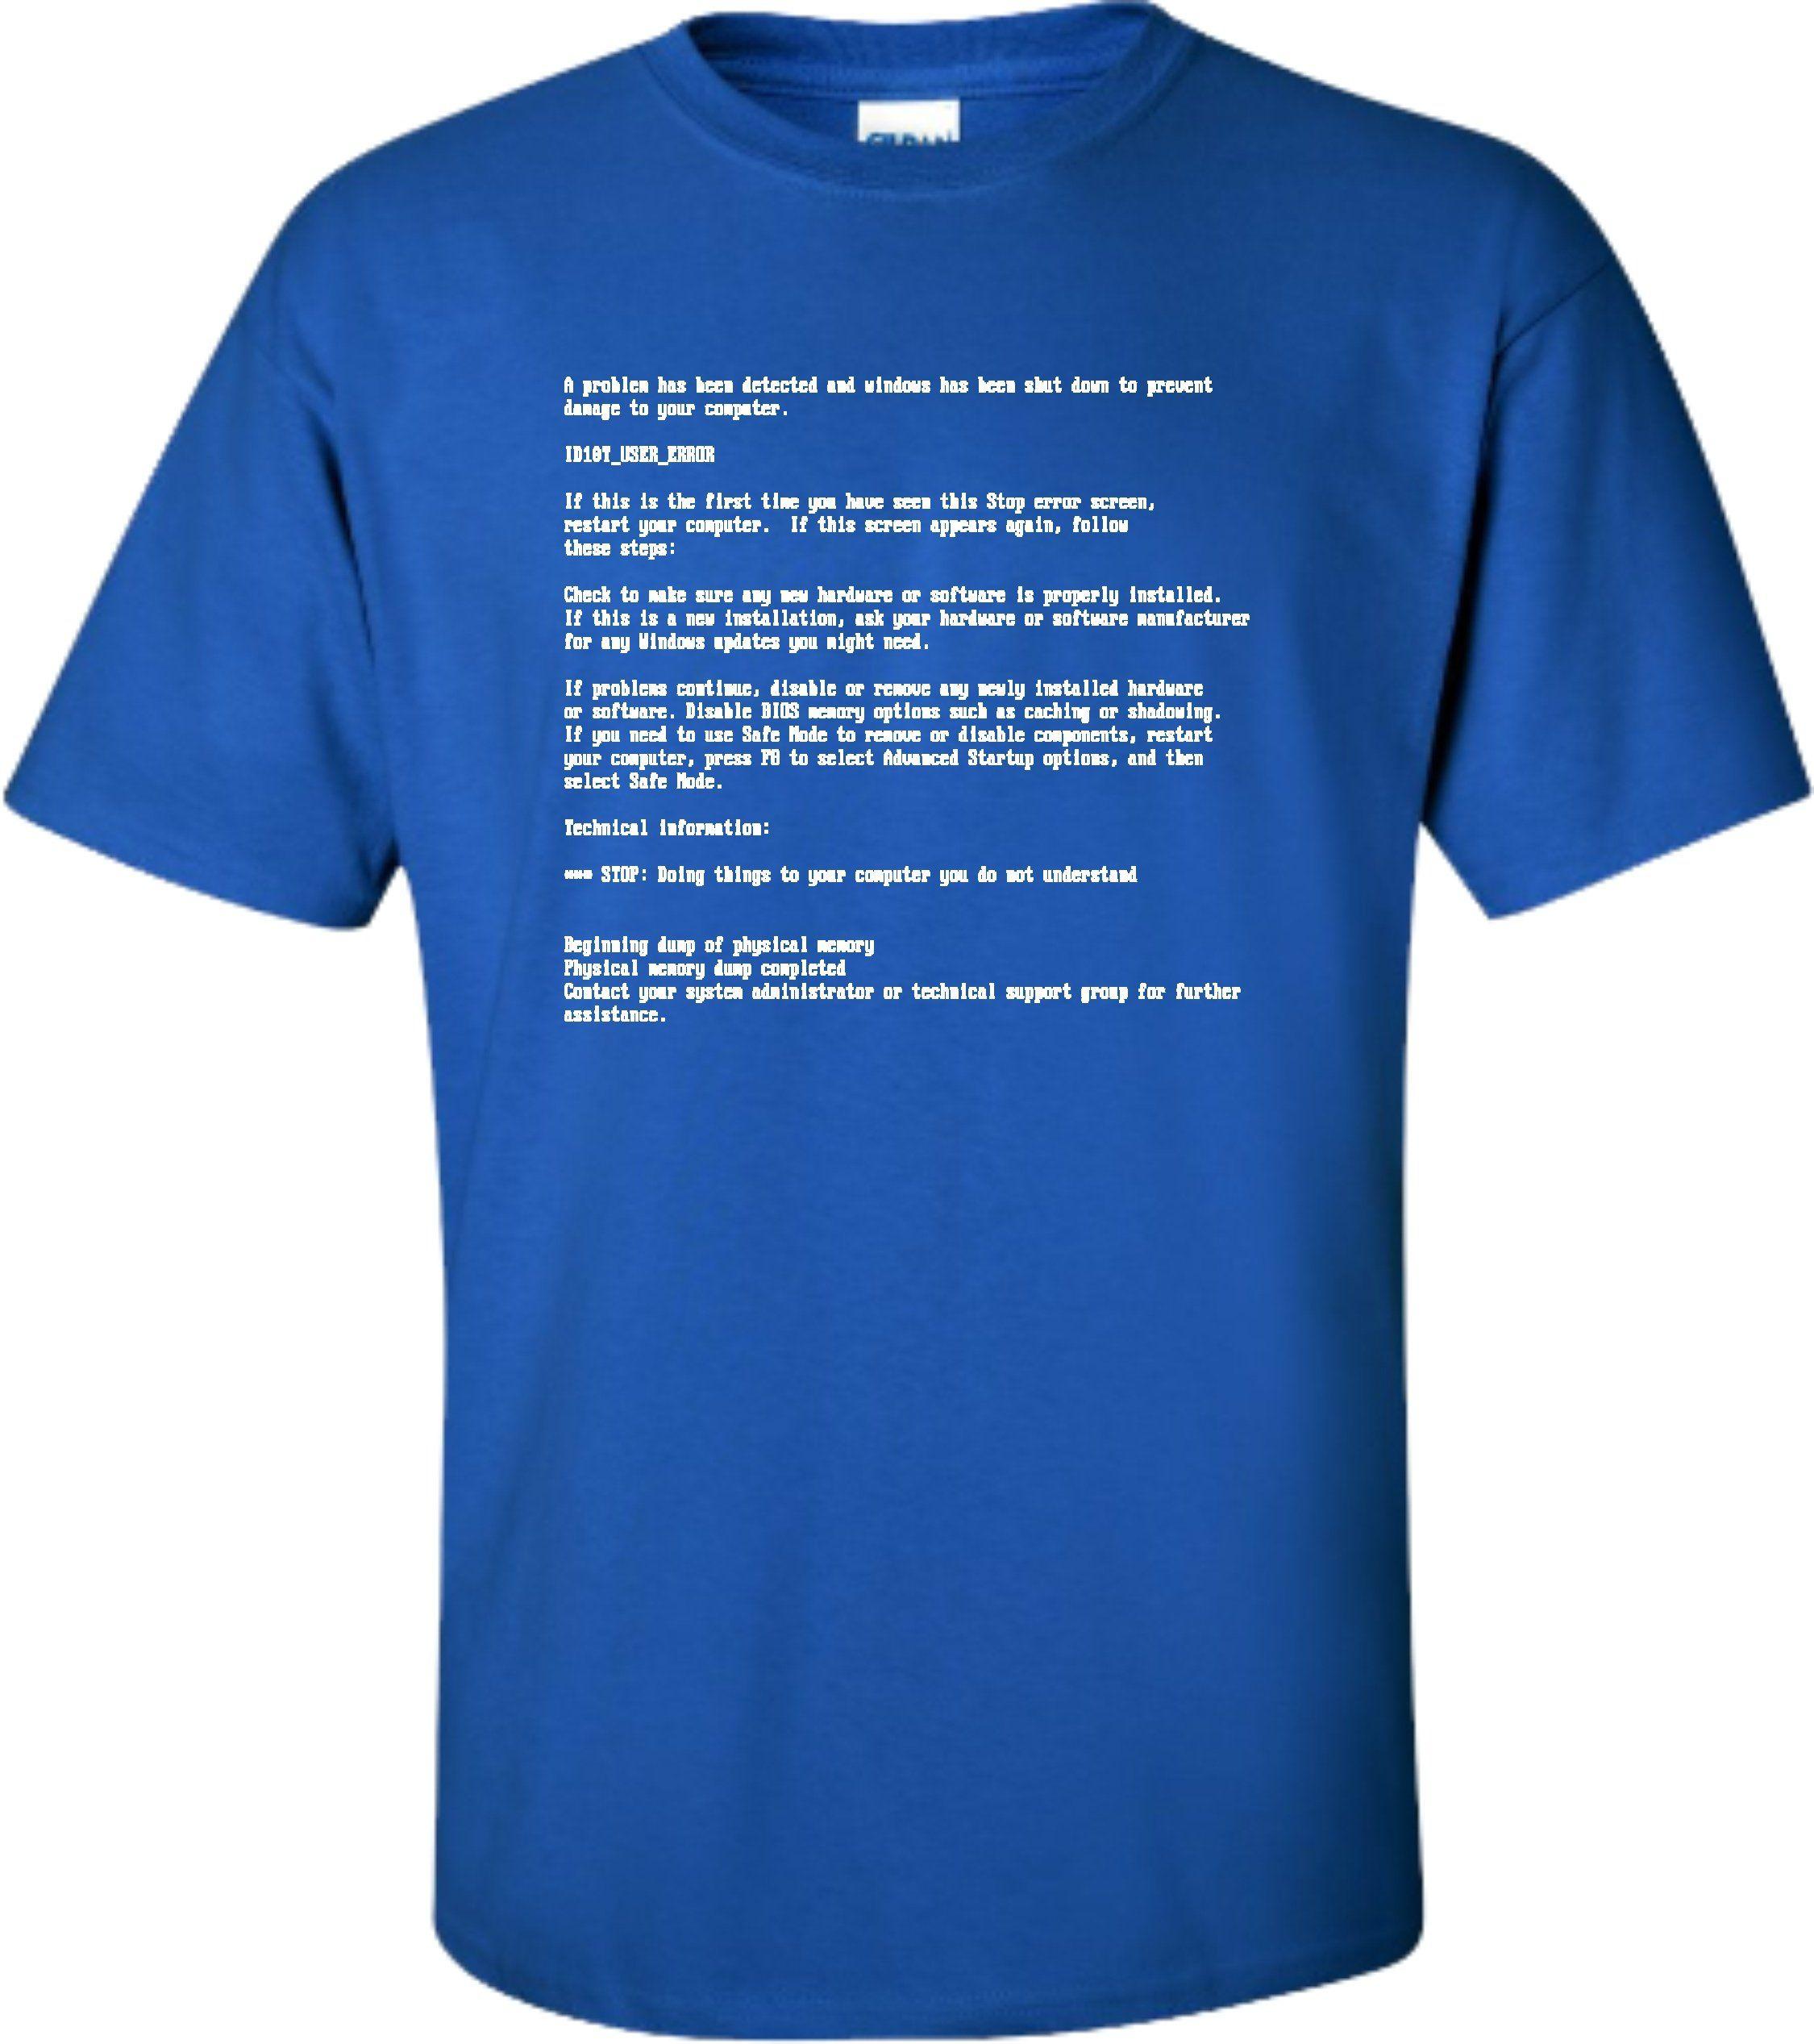 Medium Royal Blue Adult Blue Screen Of Death Funny Geek Nerd T-Shirt